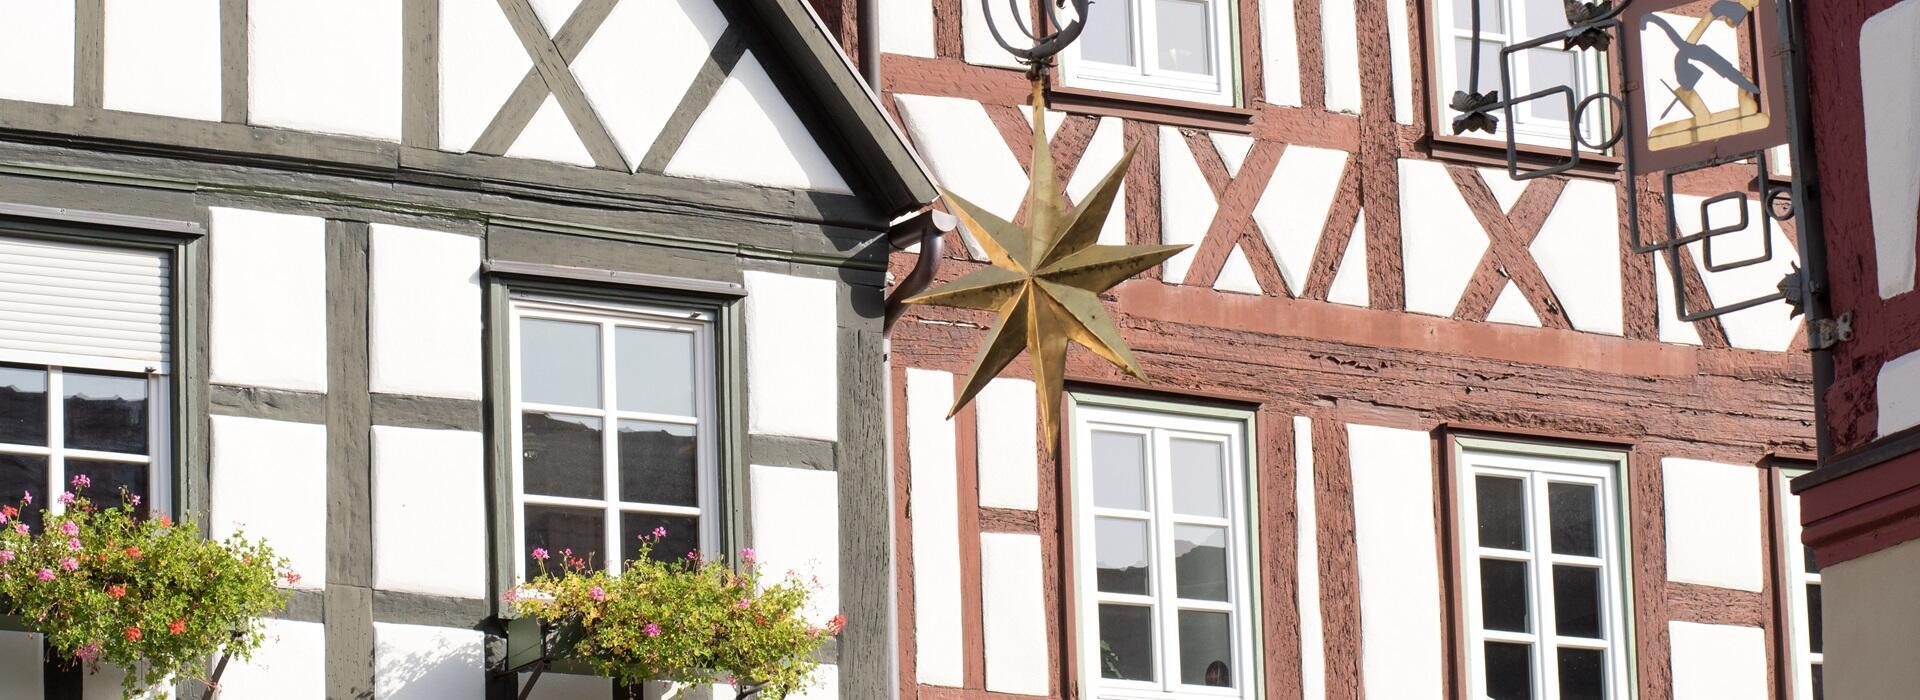 Foto©Schmelz_Fotodesign_Fachwerk_Koenigsberg_Hassberge